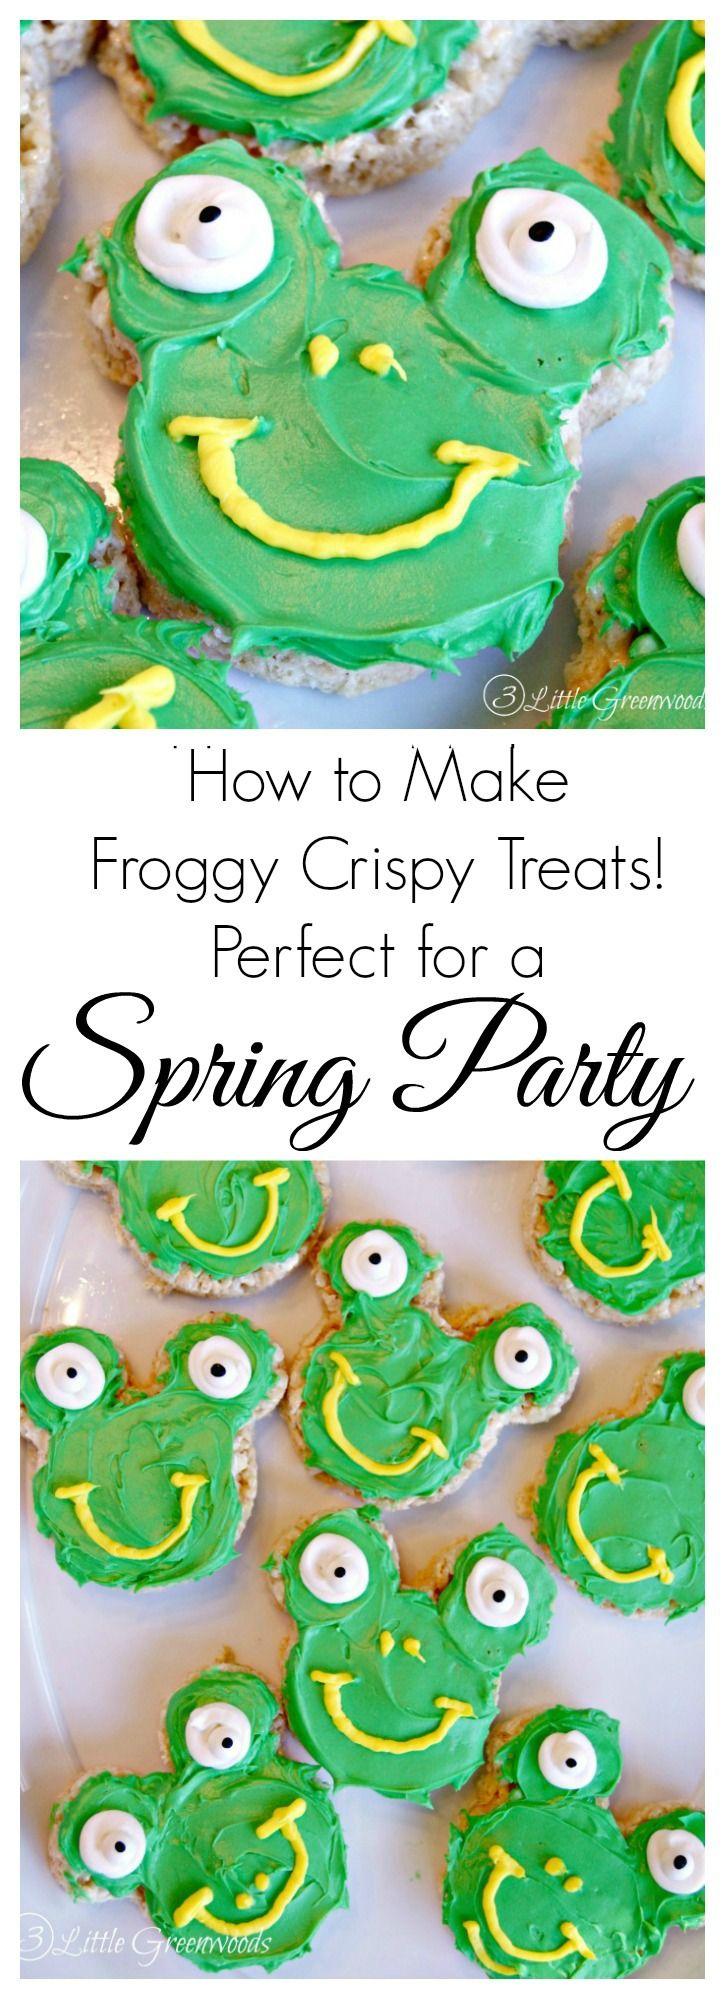 Froggy Crispy Treat An Easy Easter